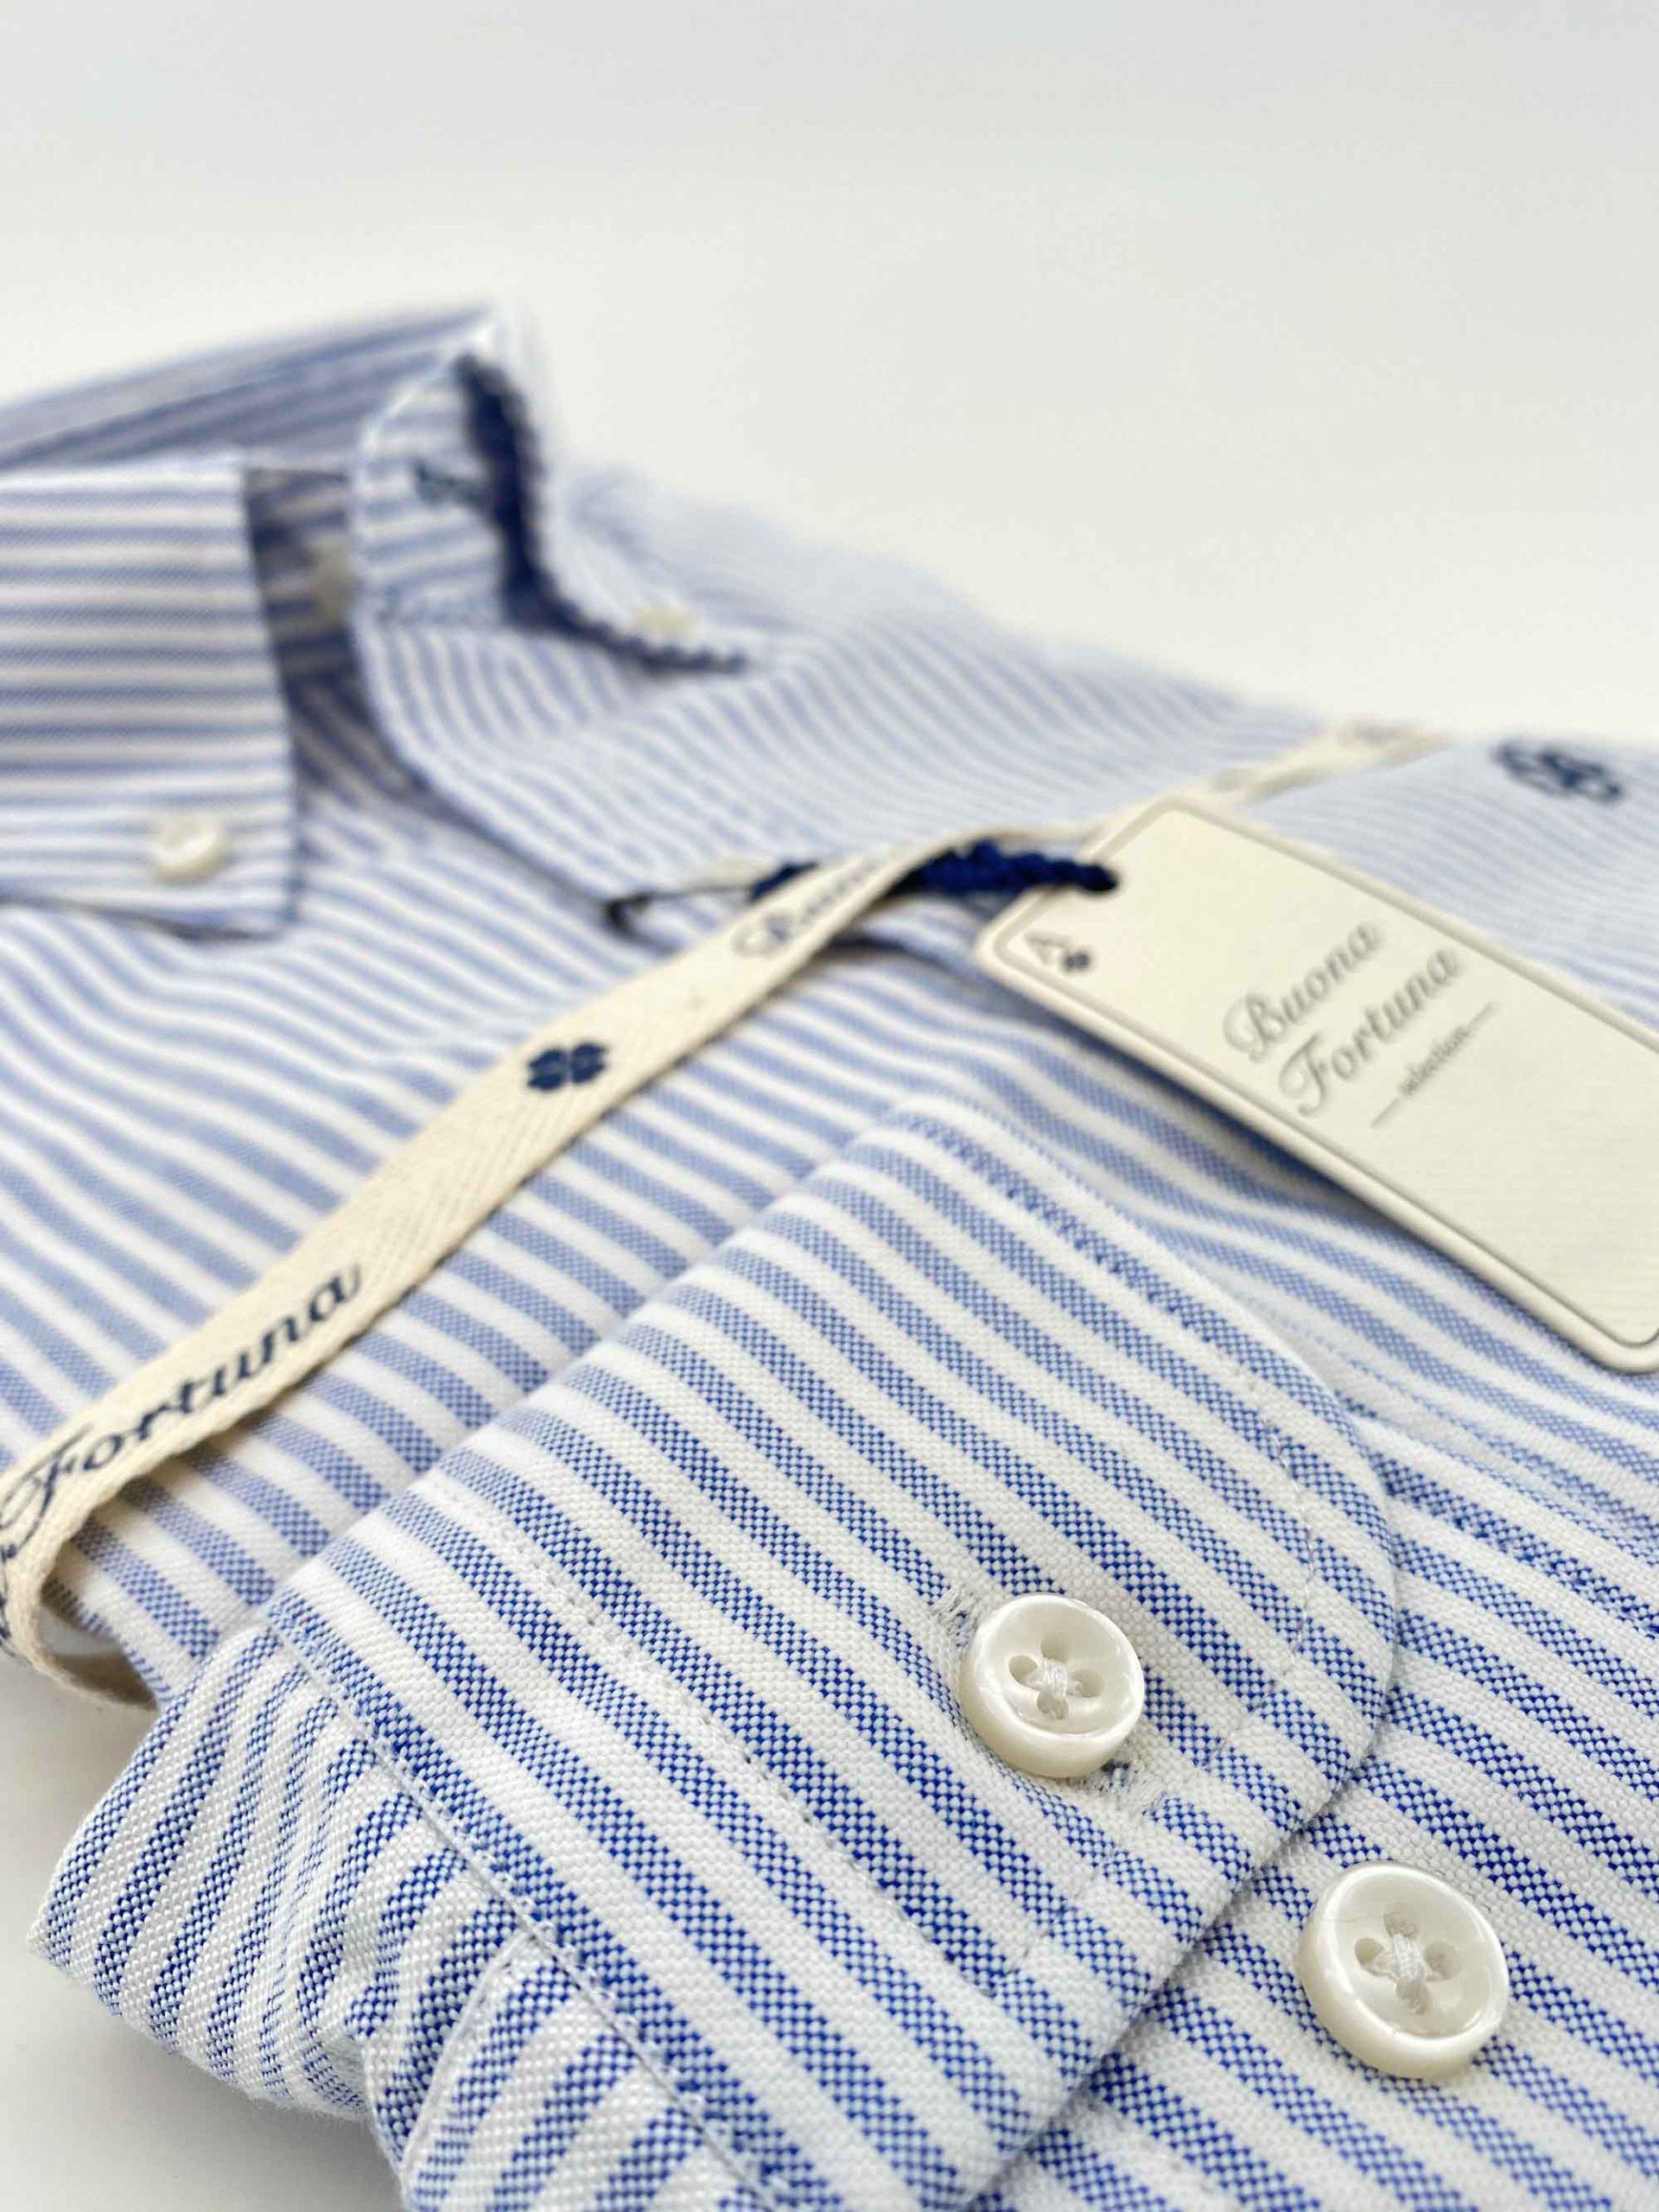 camisas-buona-fortuna-comprar-online-camisas-italianas-exlusivas-oxford-gruesa-raya-fina-detalle-8